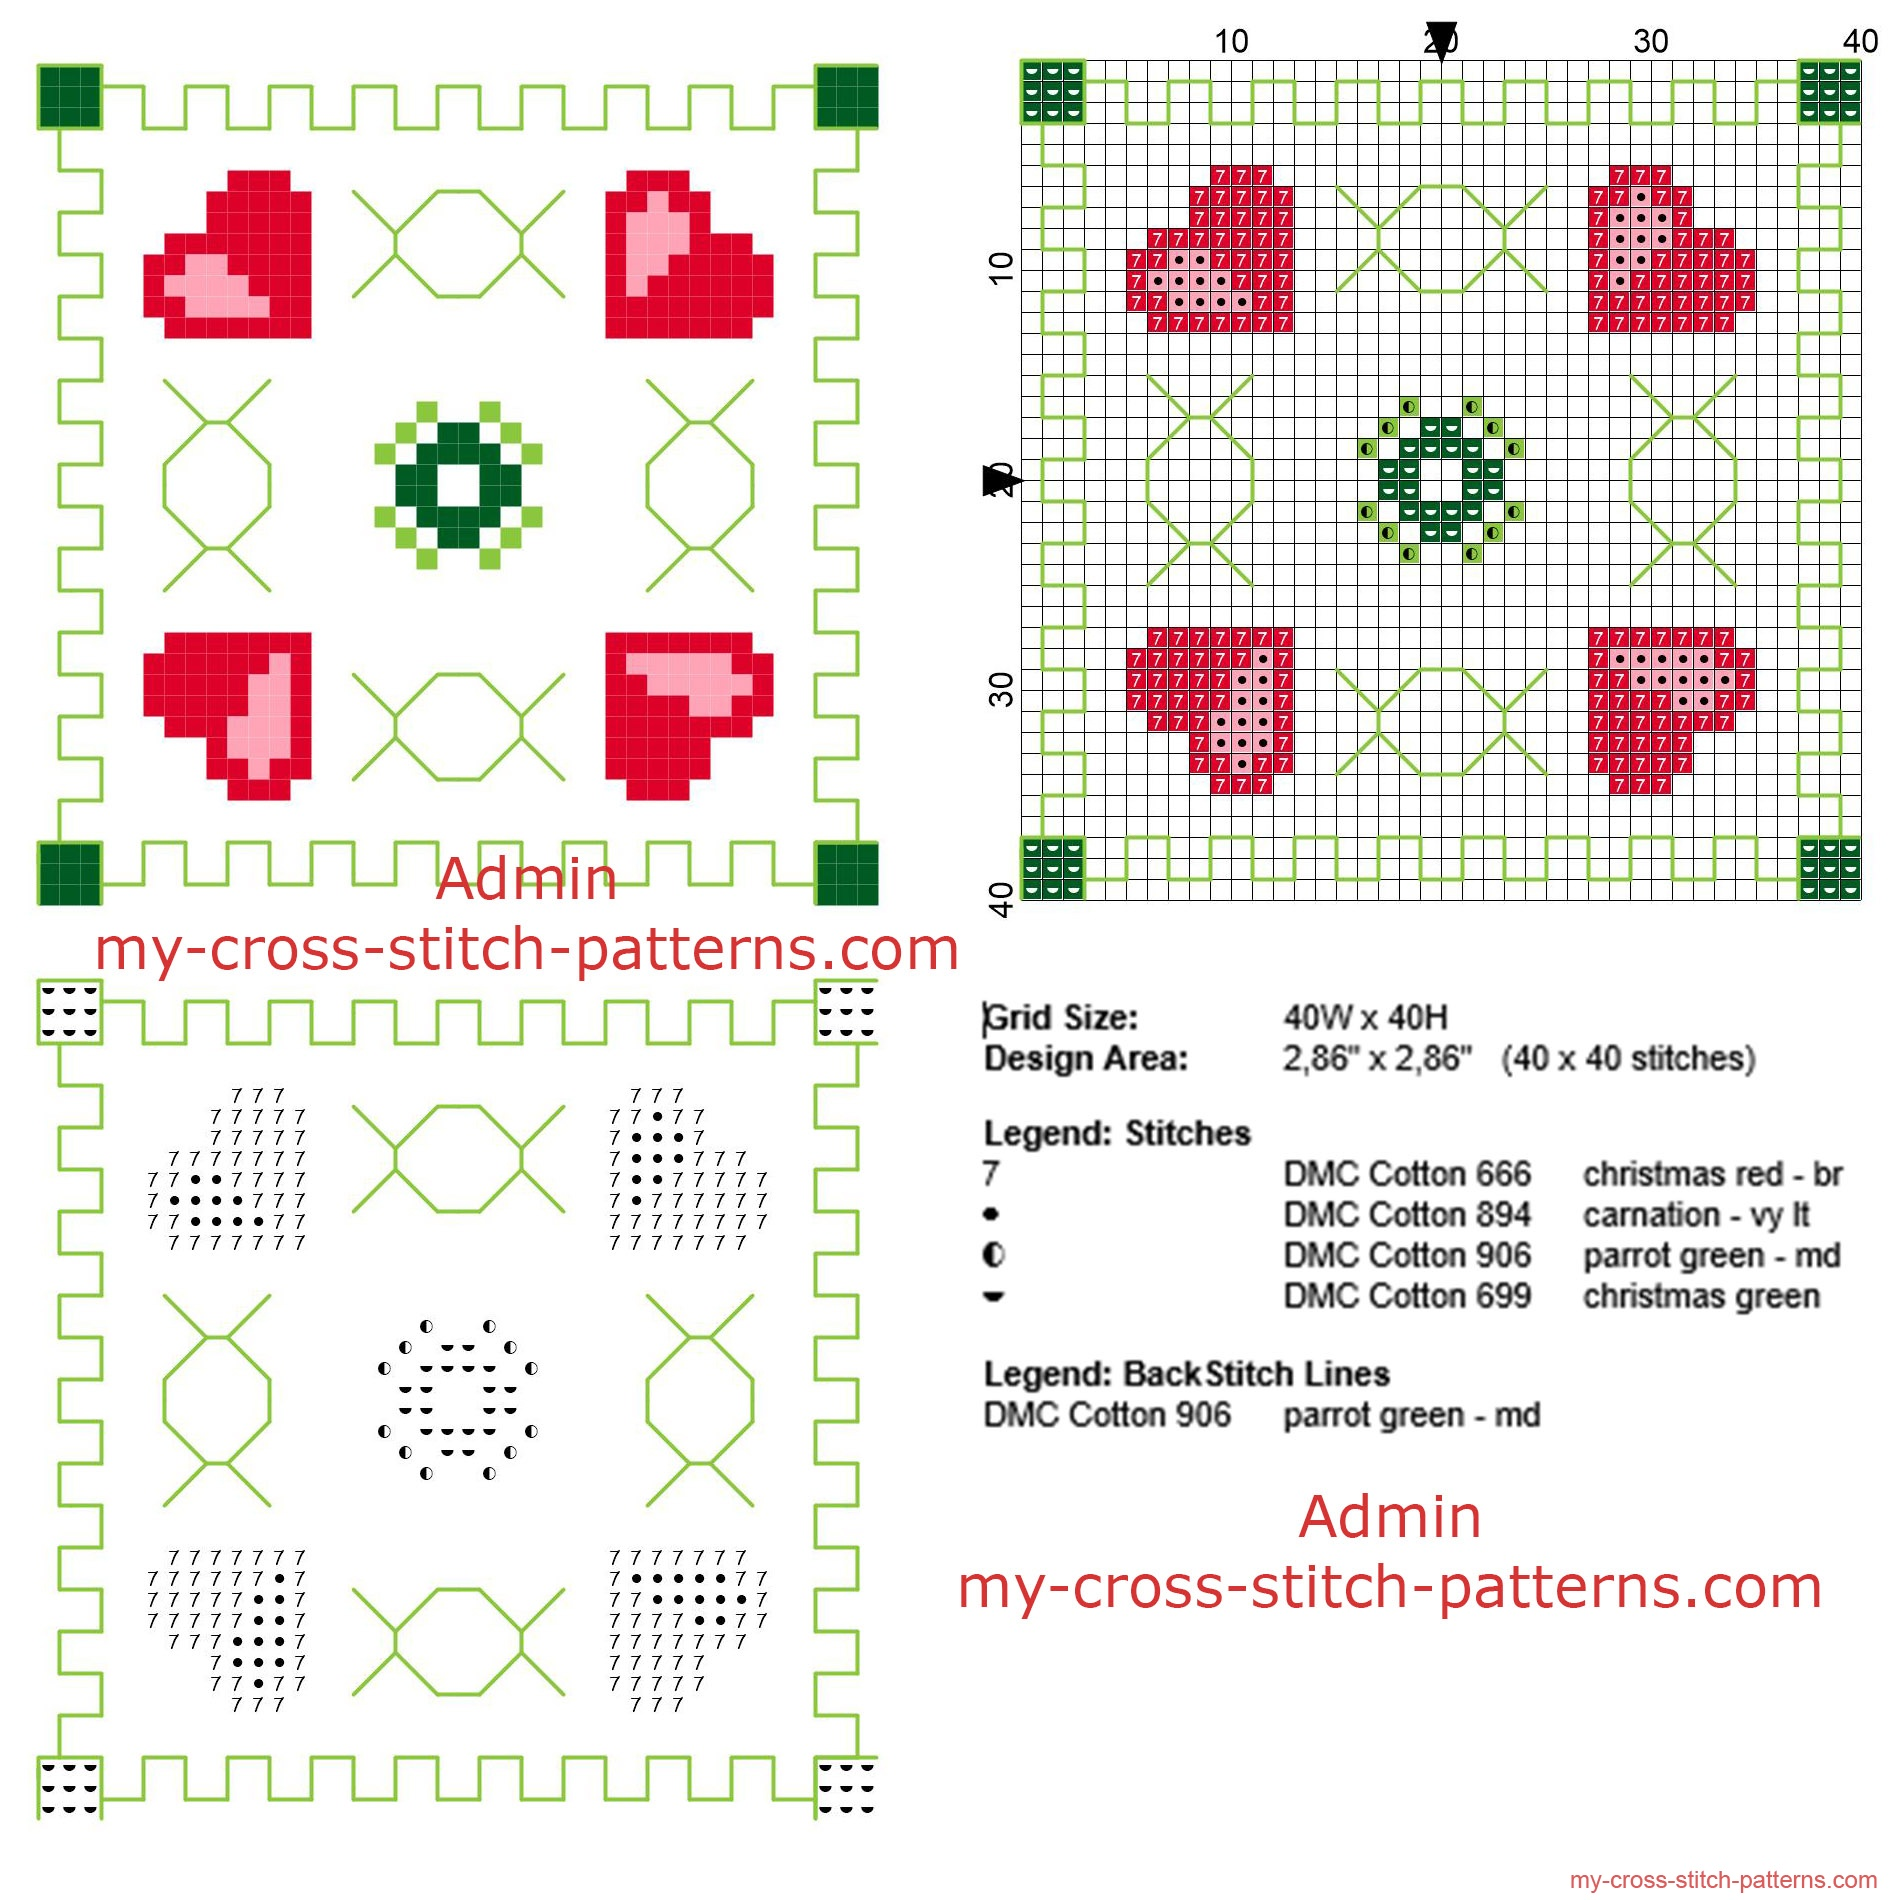 cross_stitch_biscornu_pattern_with_four_hearts_and_geometric_shapes_size_40_x_40_stitches